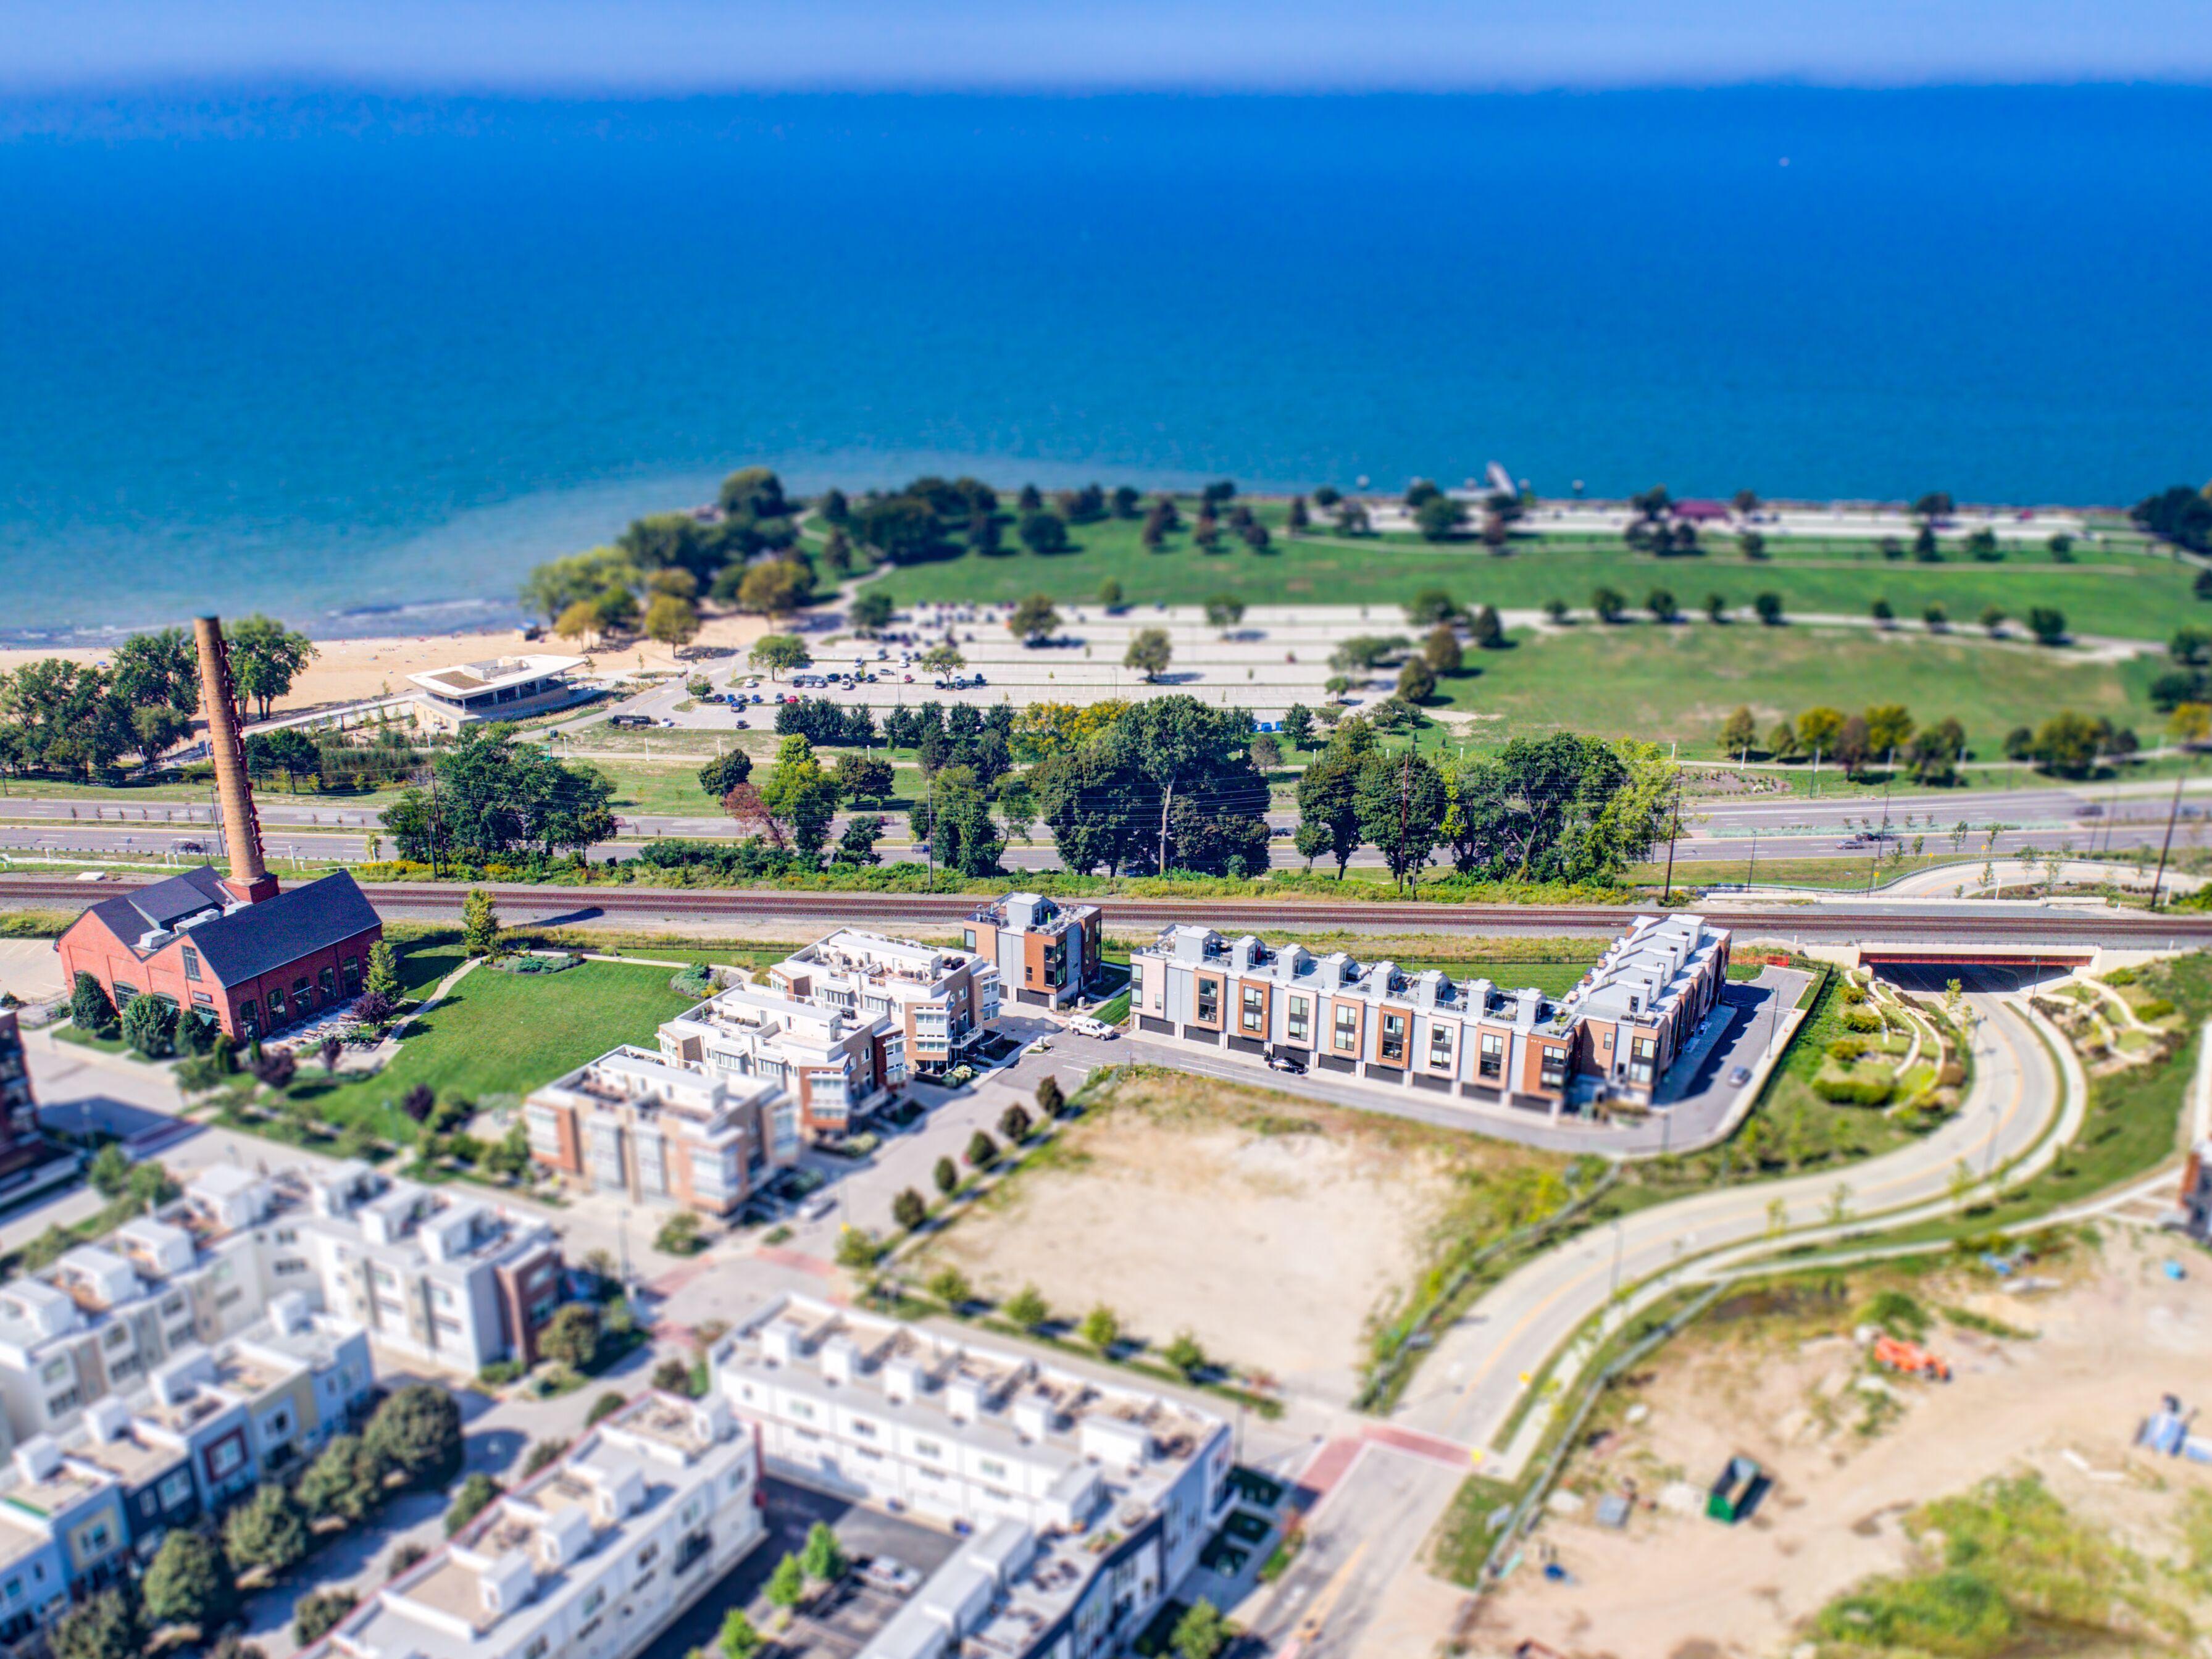 Rustic Modern Detroit Shoreway Edgewater Park 1 Bed Apt 2021 Room Prices Deals Reviews Expedia Com